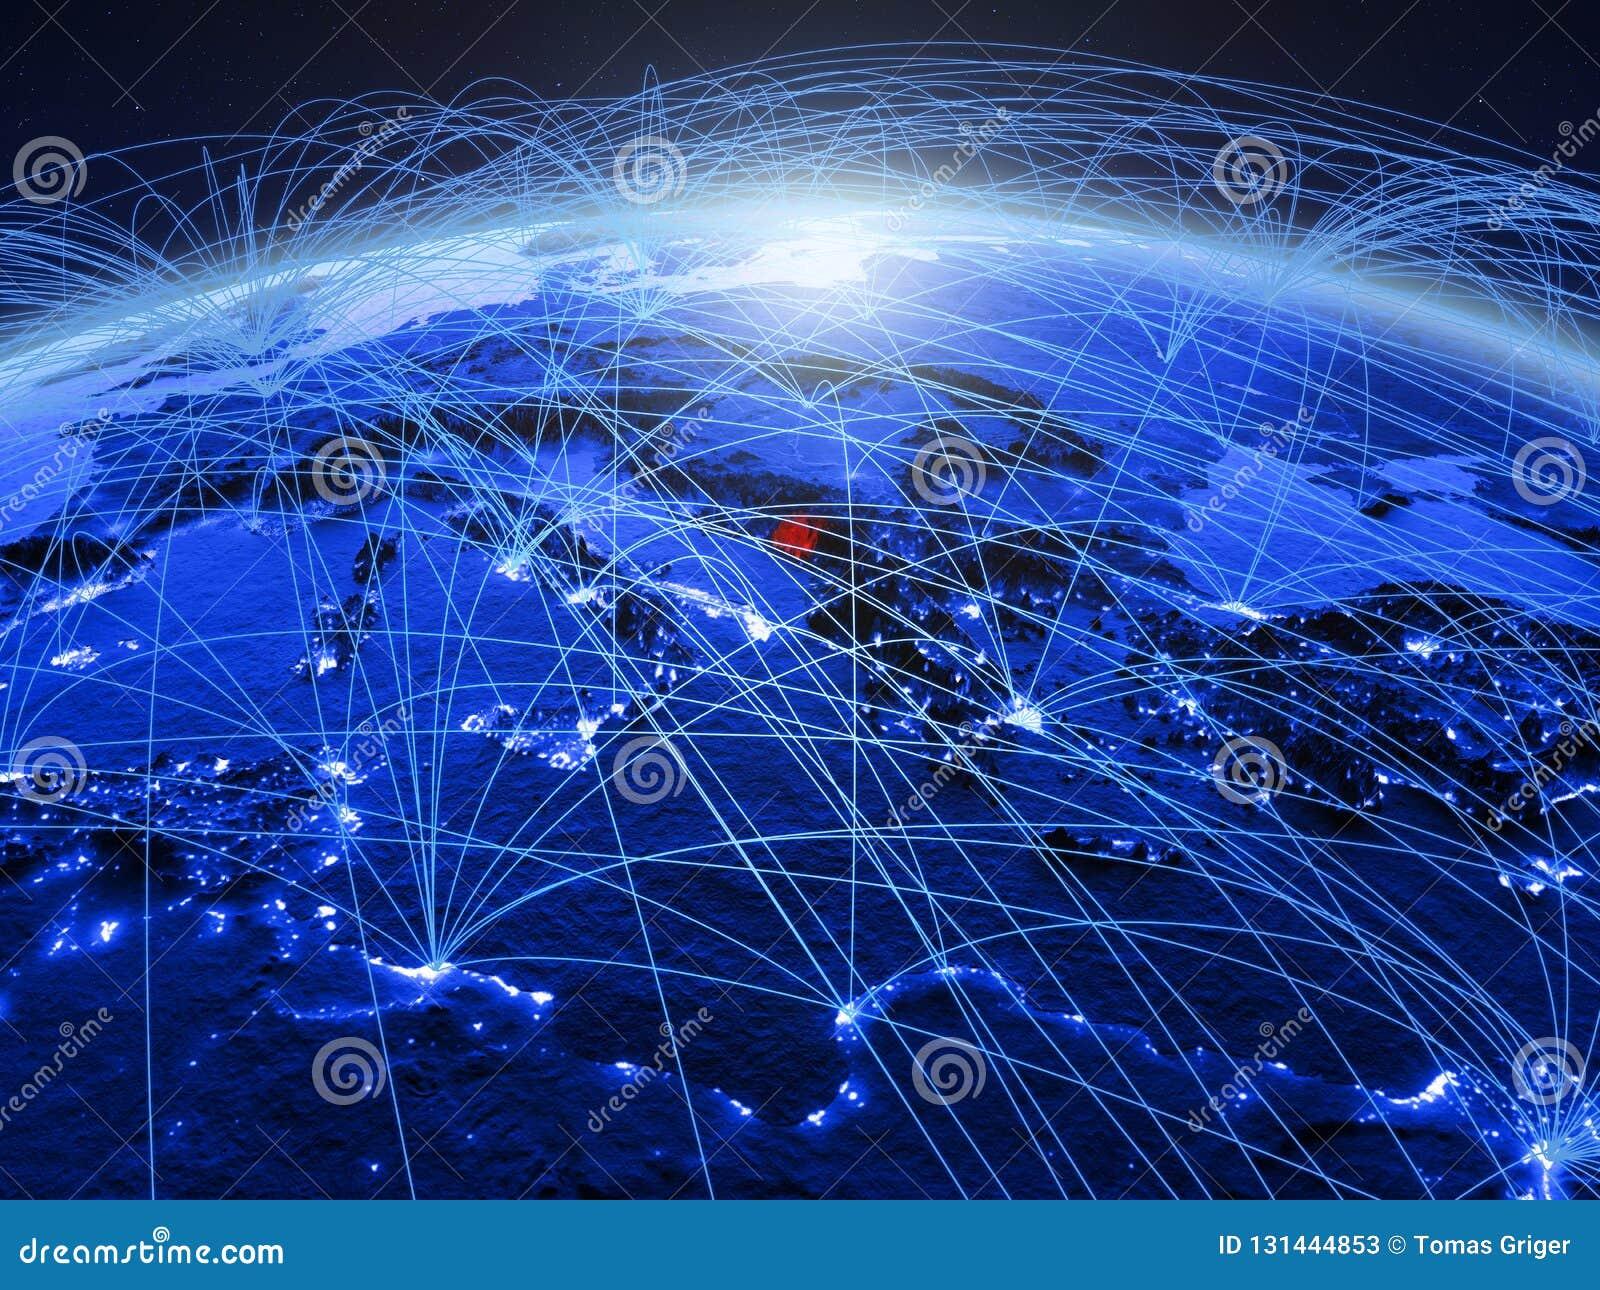 Montenegro op blauwe digitale aarde met internationaal netwerk die mededeling, reis en verbindingen vertegenwoordigen 3d